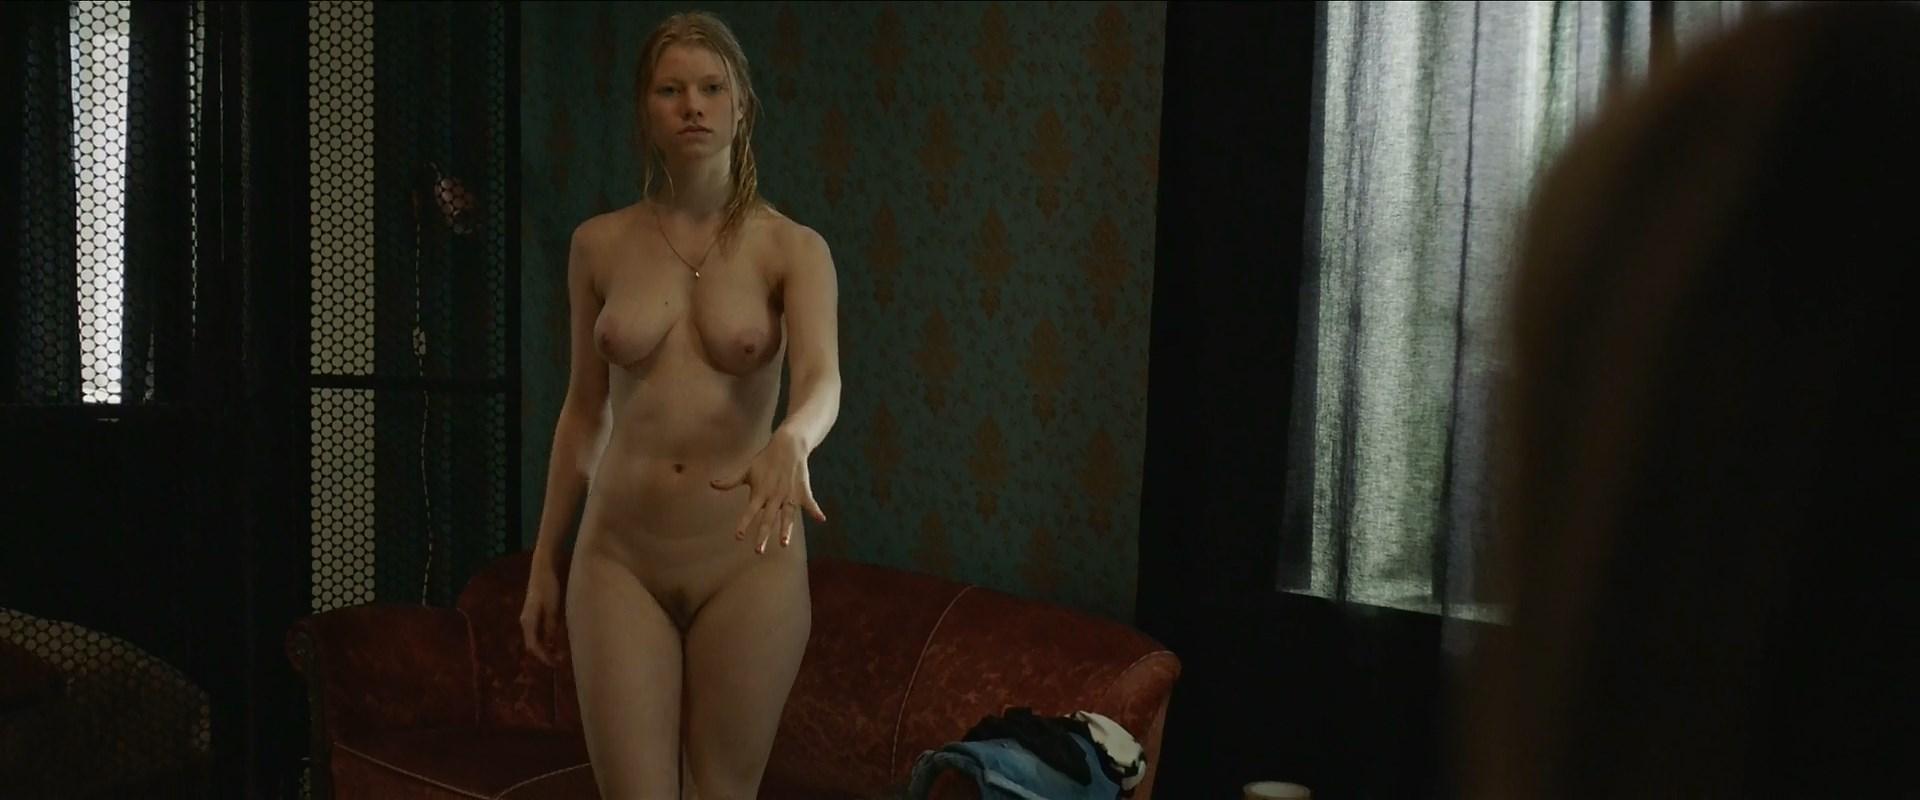 Milena Karas  nackt